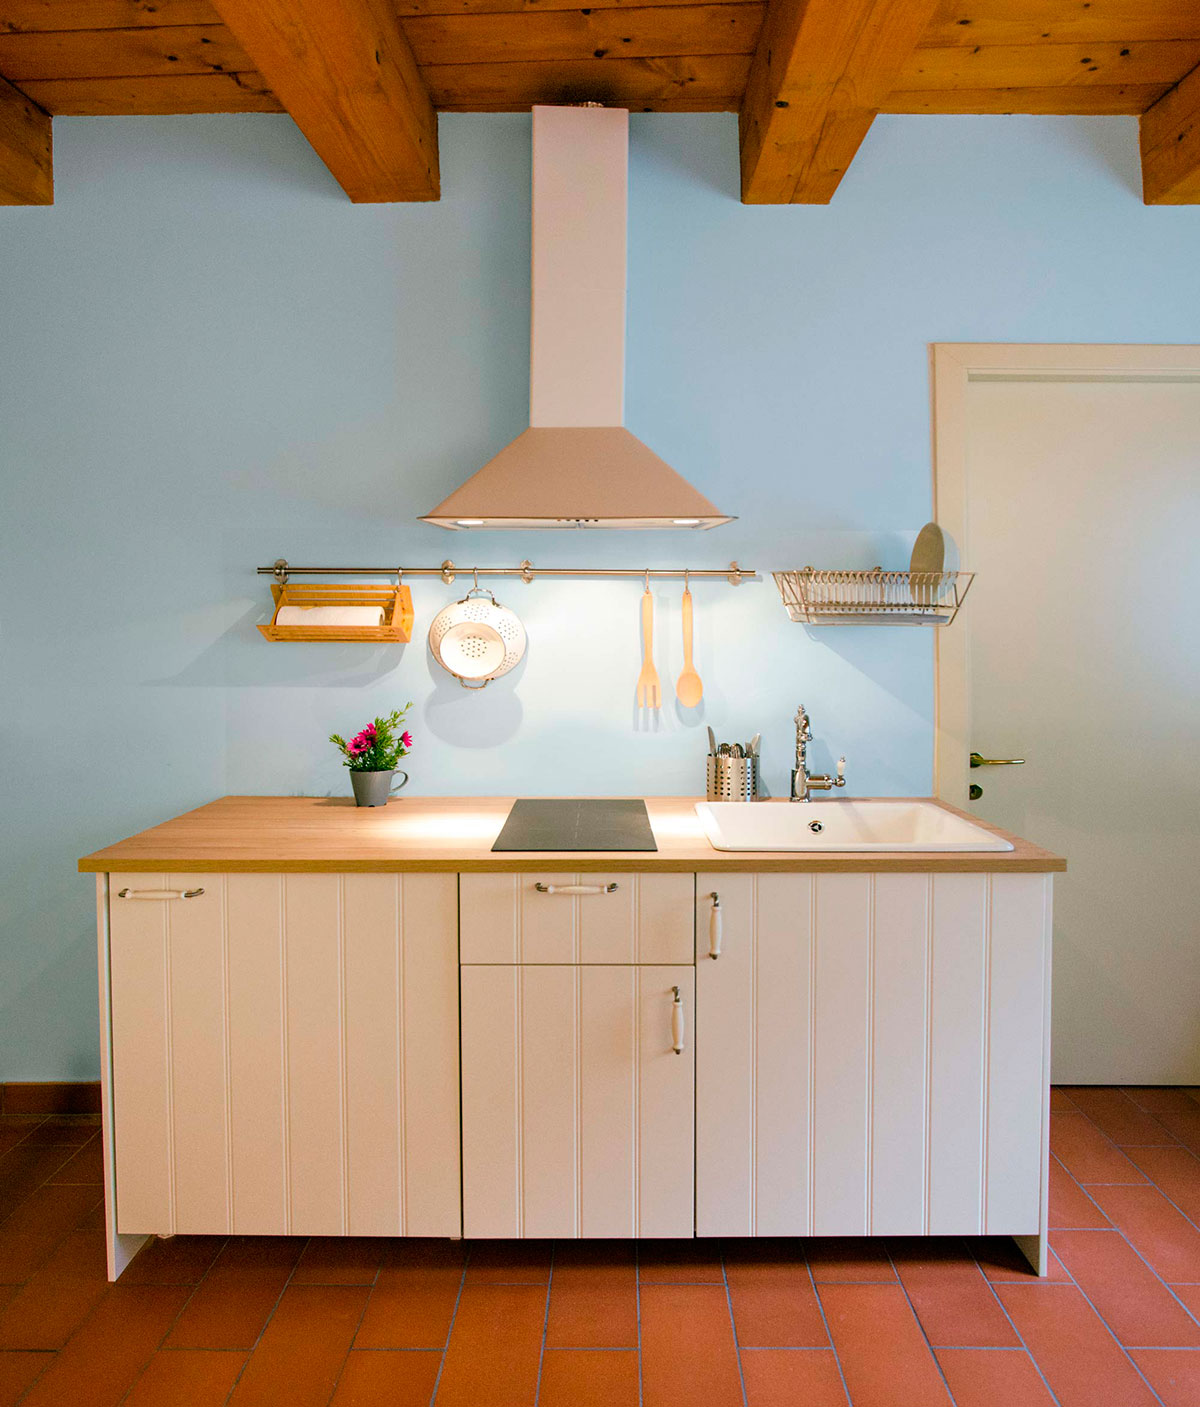 Cucina azzurra for Cucina azzurra